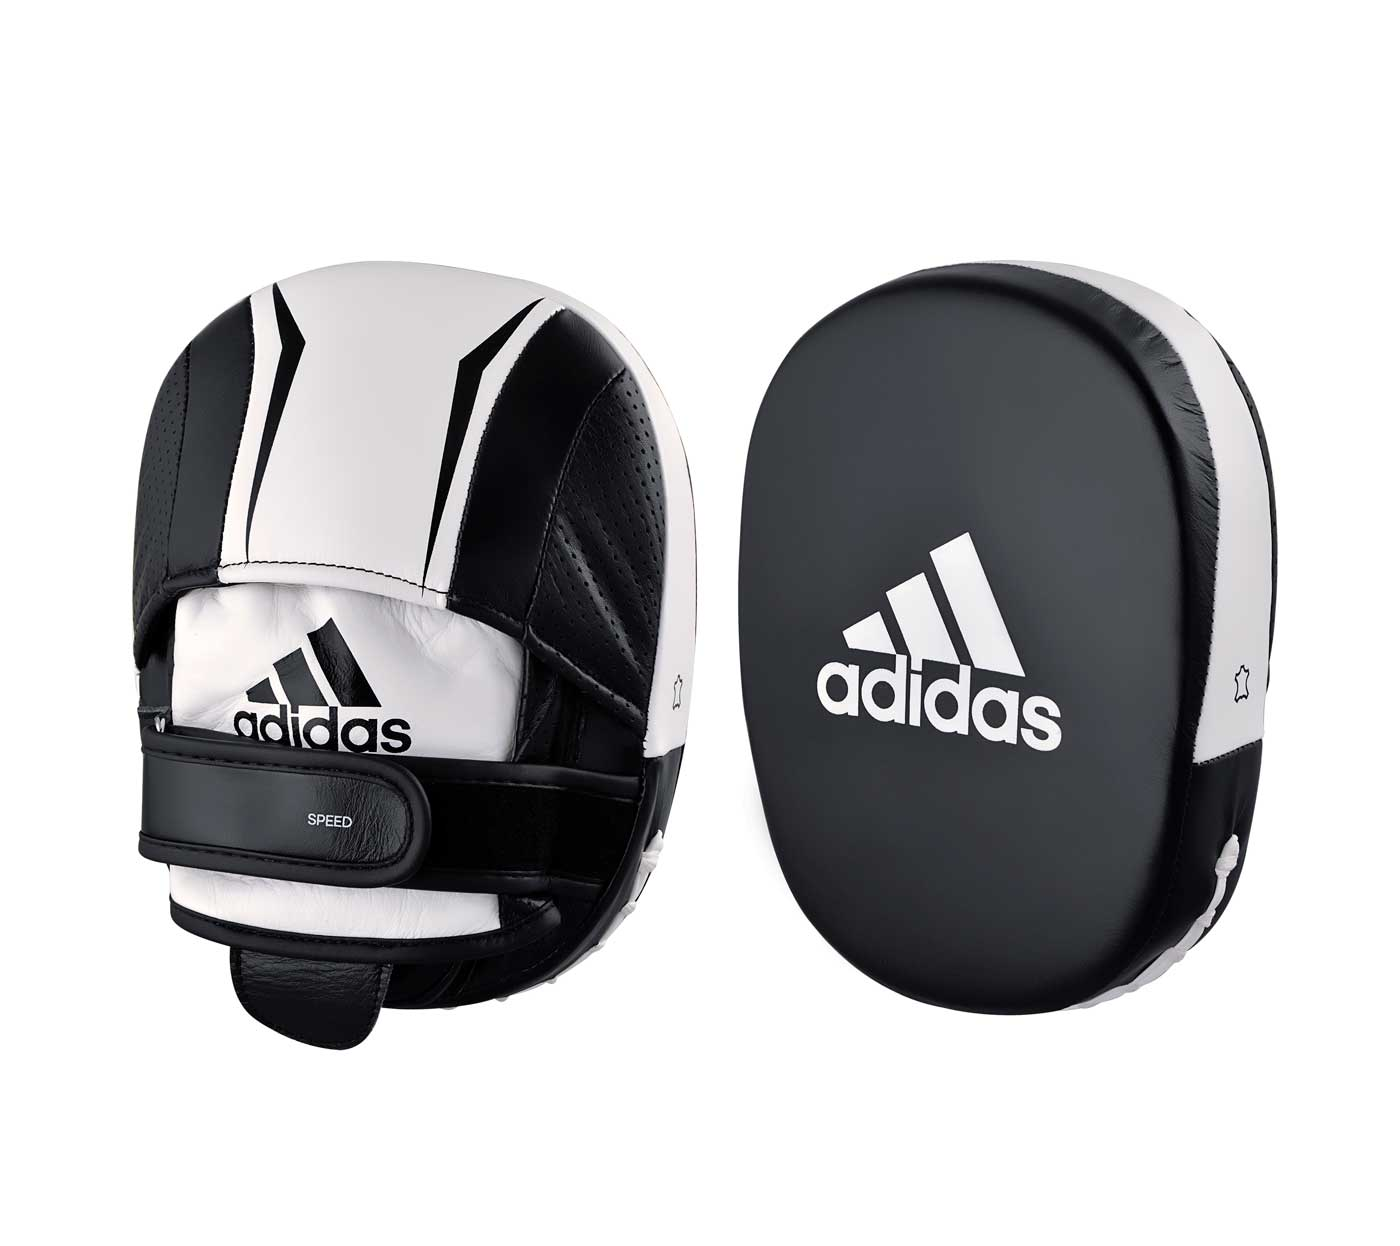 Лапы Adidas Speed 550 Micro Air Focus Mitt черно-белые,  артикул adiSP550FM